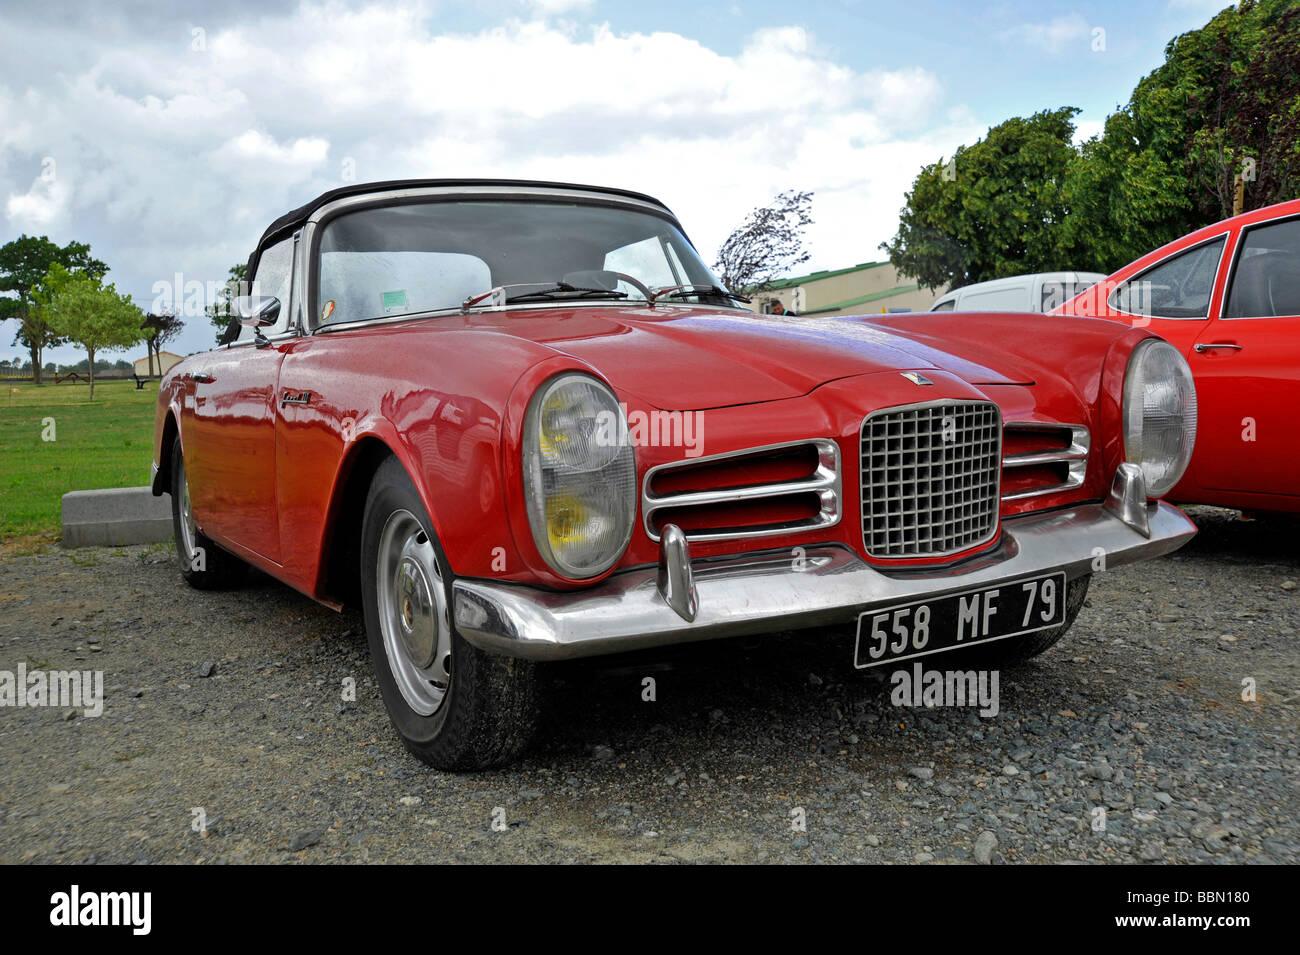 Old Classic French Facel Vega Sports Car automobile Stock Photo ...